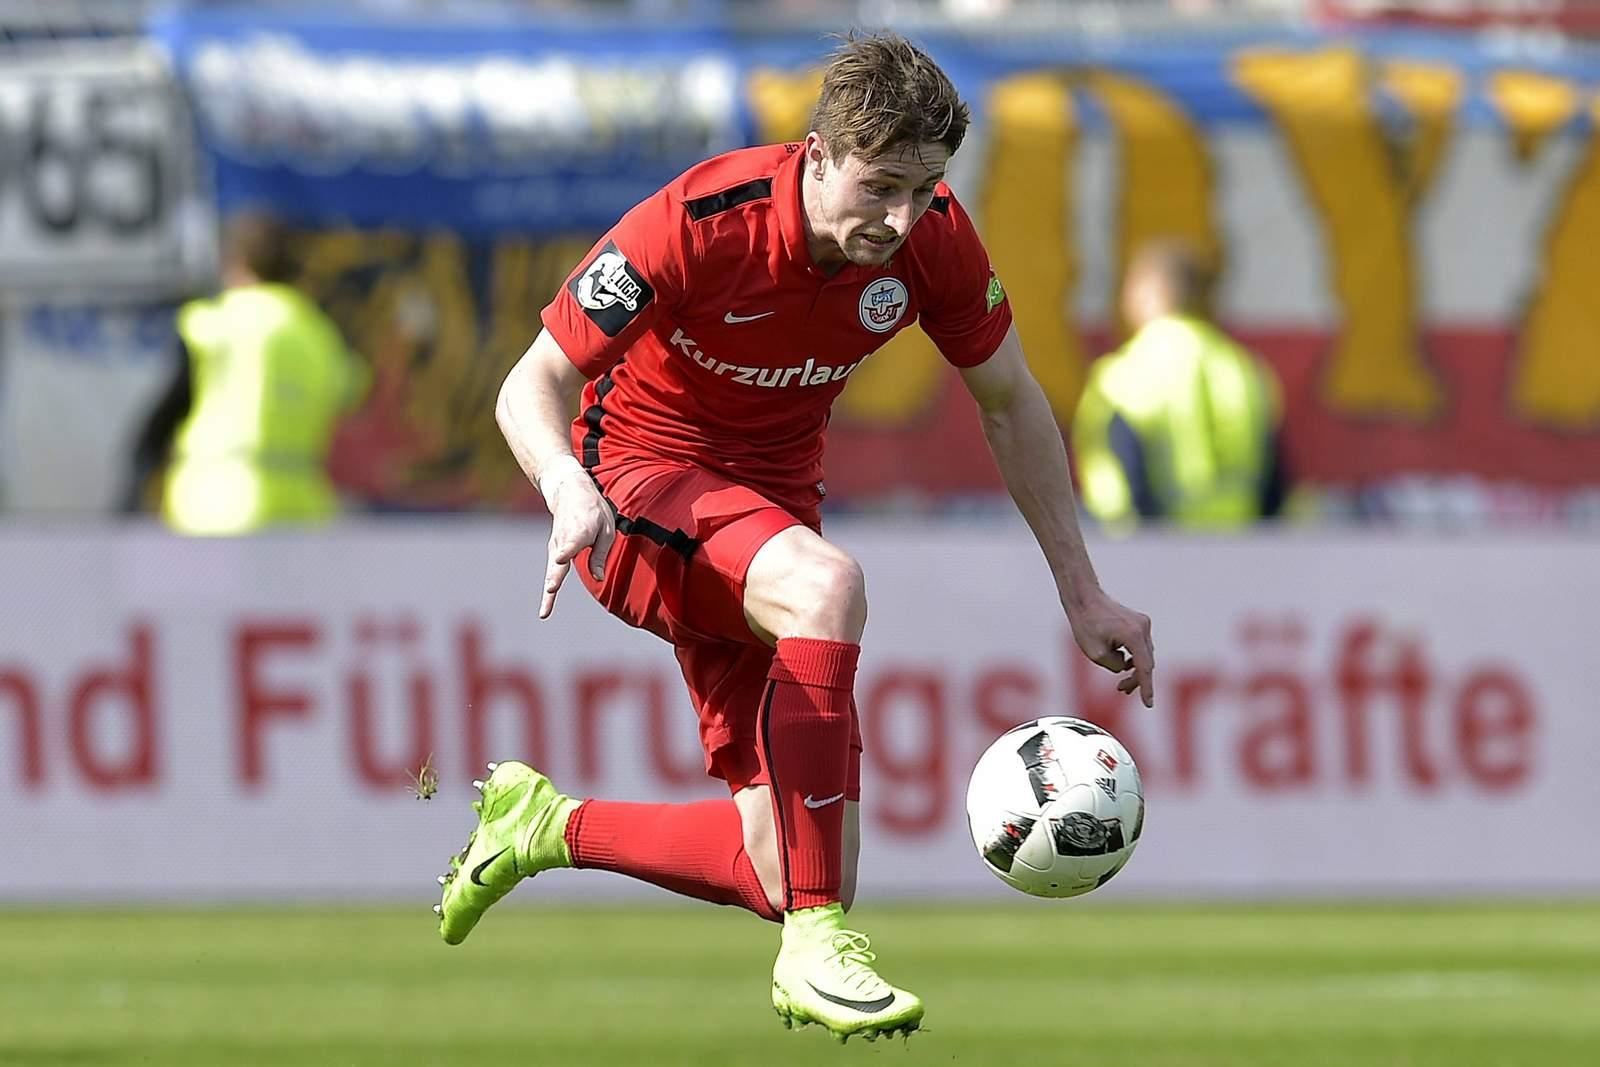 Stephan Andrist von Hansa Rostock